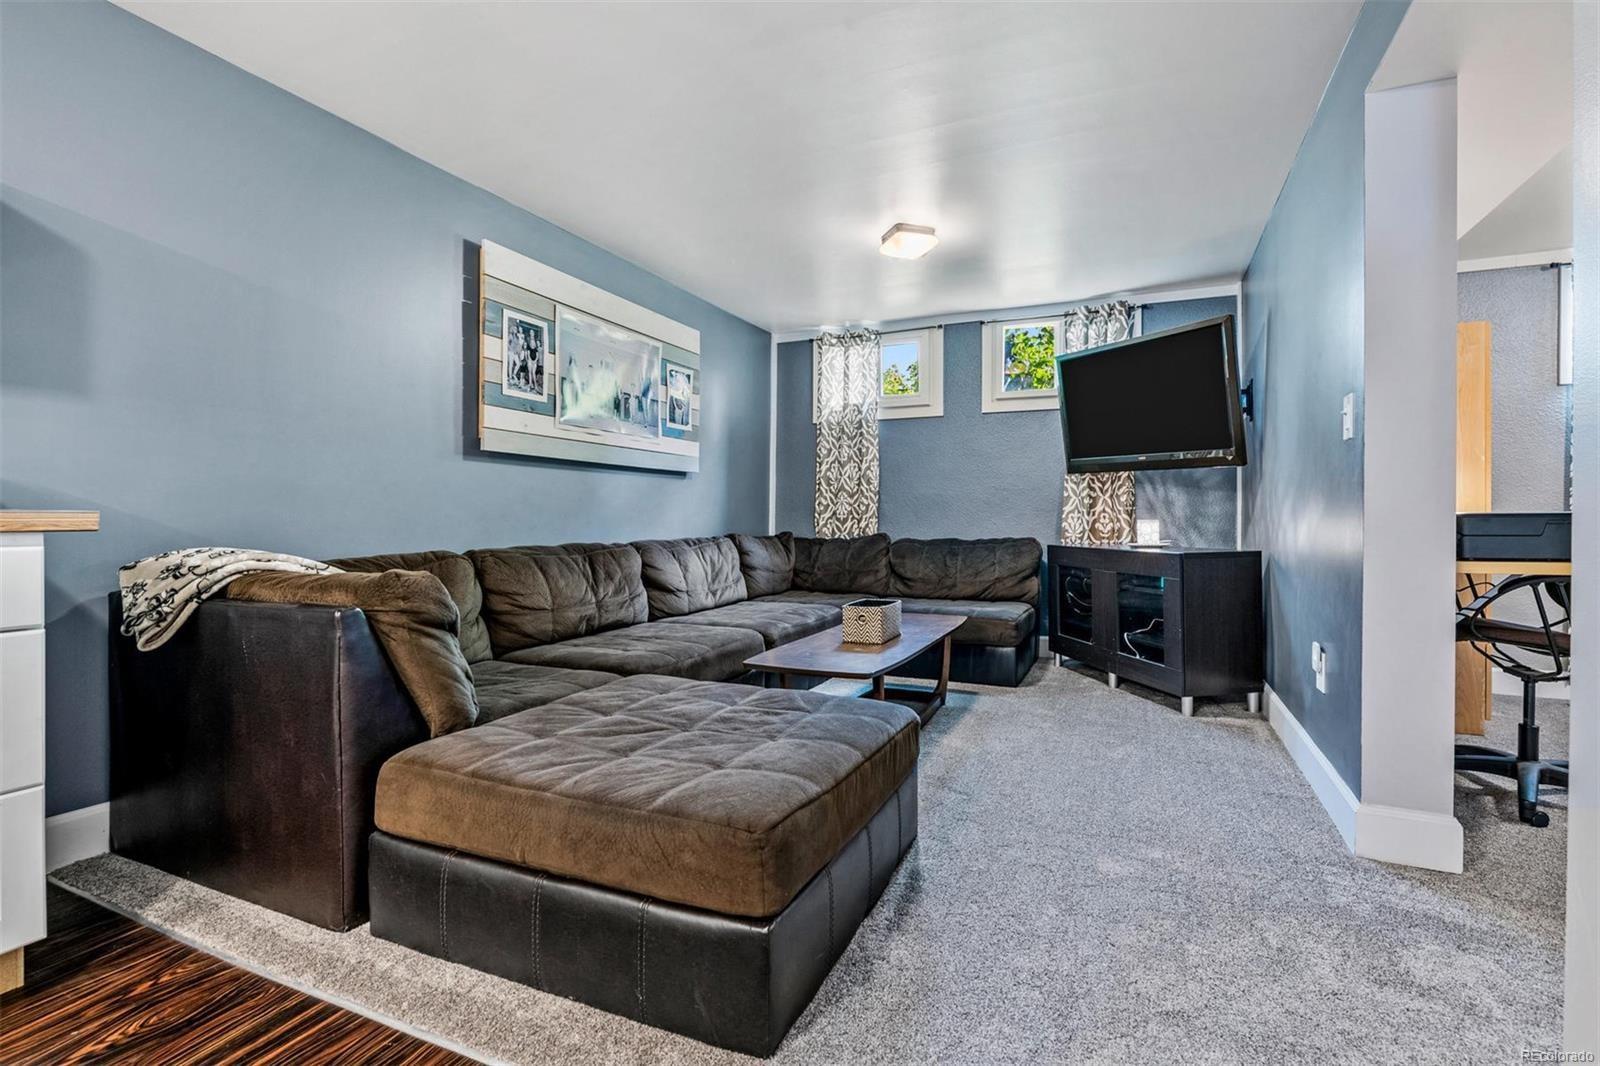 MLS# 1664522 - 1 - 6260  W 61st Avenue, Arvada, CO 80003